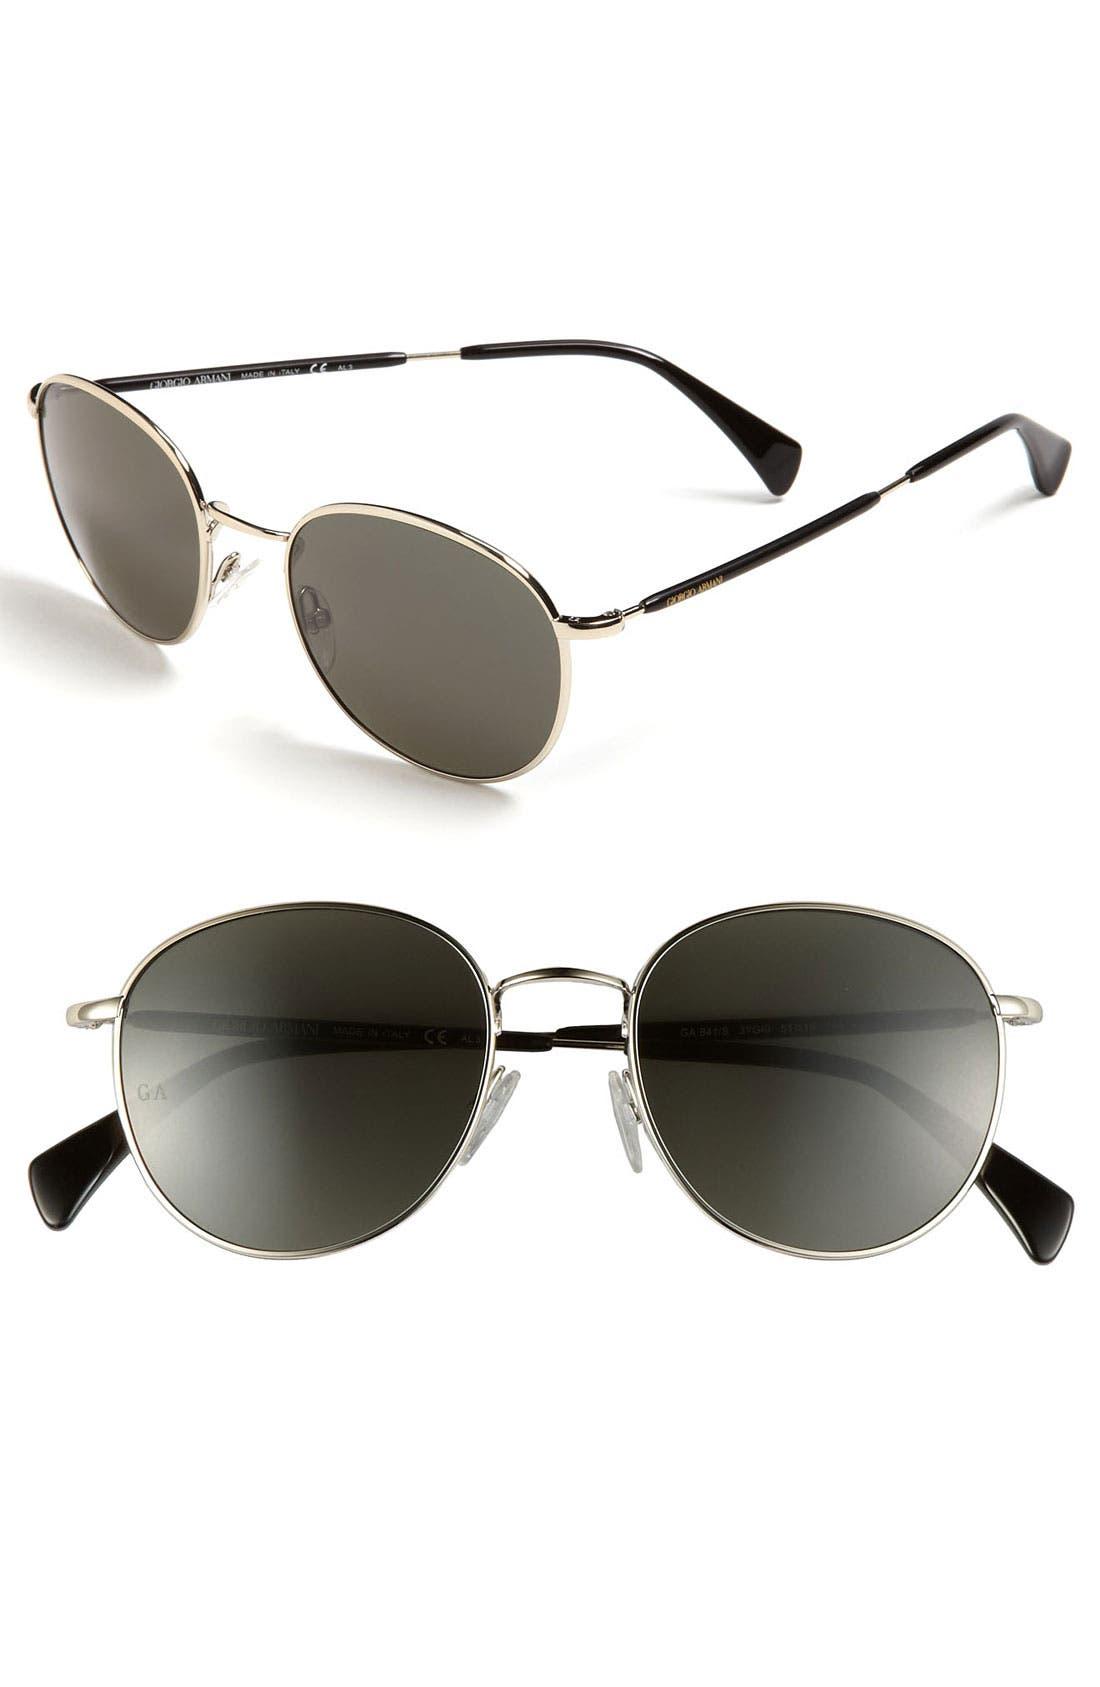 Main Image - Giorgio Armani Round Sunglasses